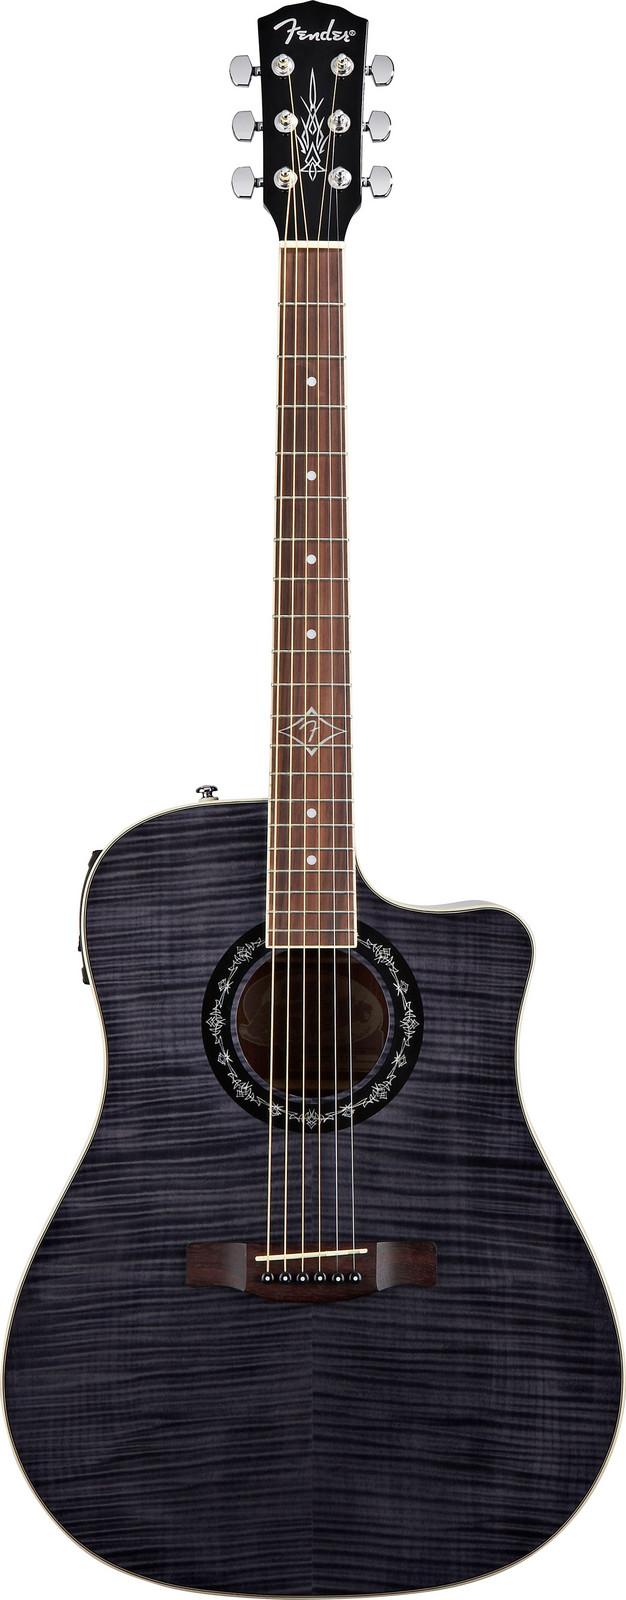 fender t bucket 300 ce guitars bass. Black Bedroom Furniture Sets. Home Design Ideas